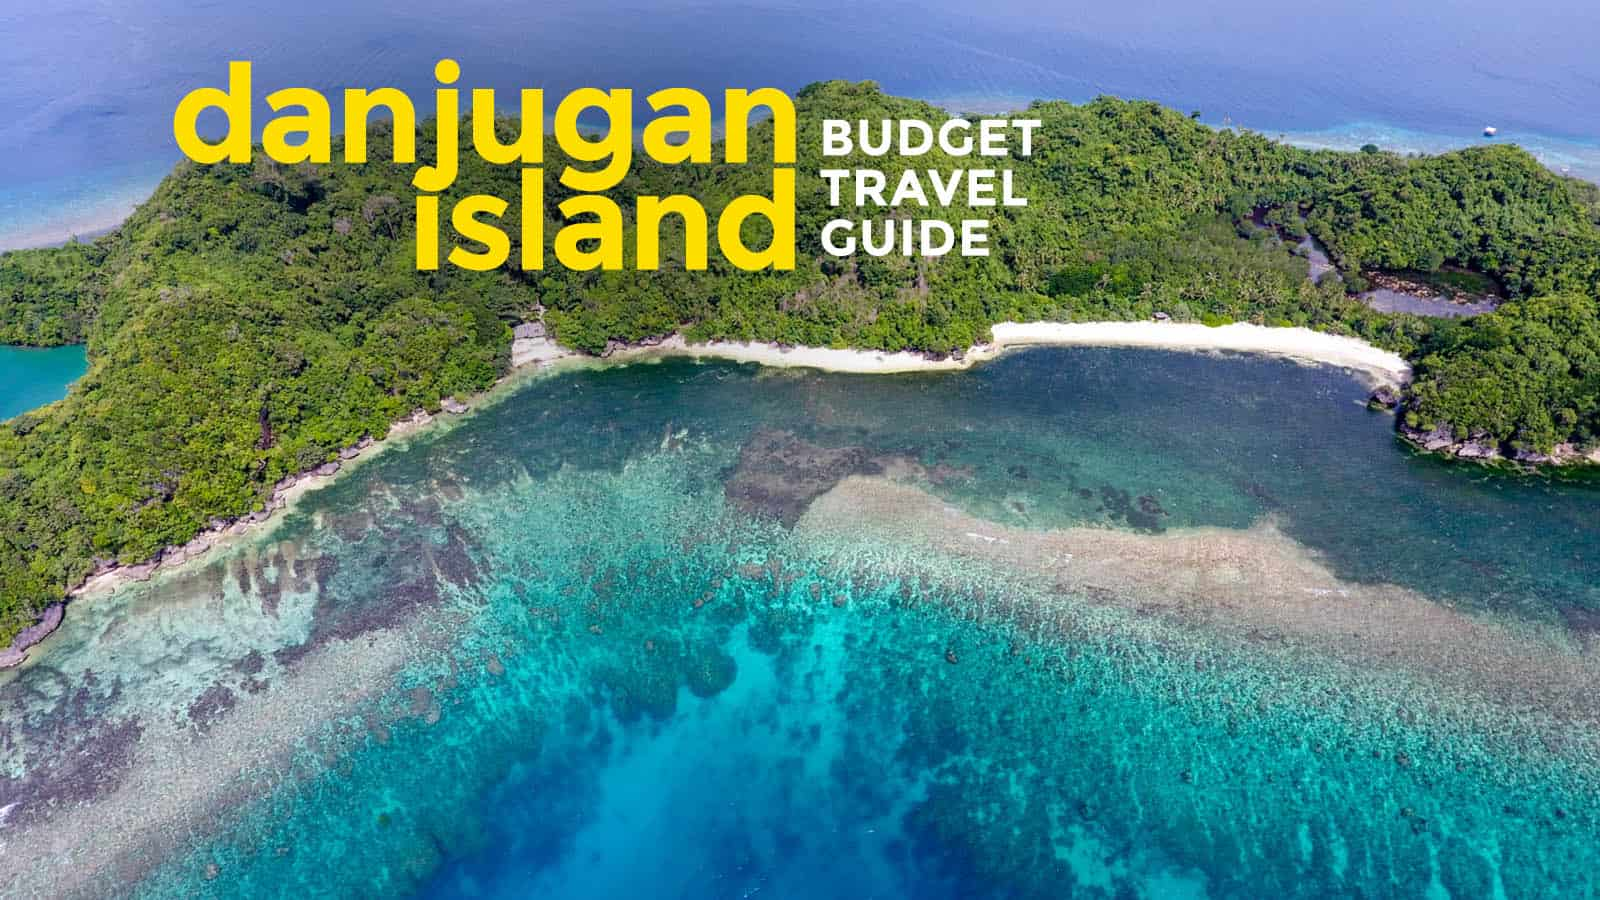 DANJUGAN ISLAND ON A BUDGET: Travel Guide & Itinerary